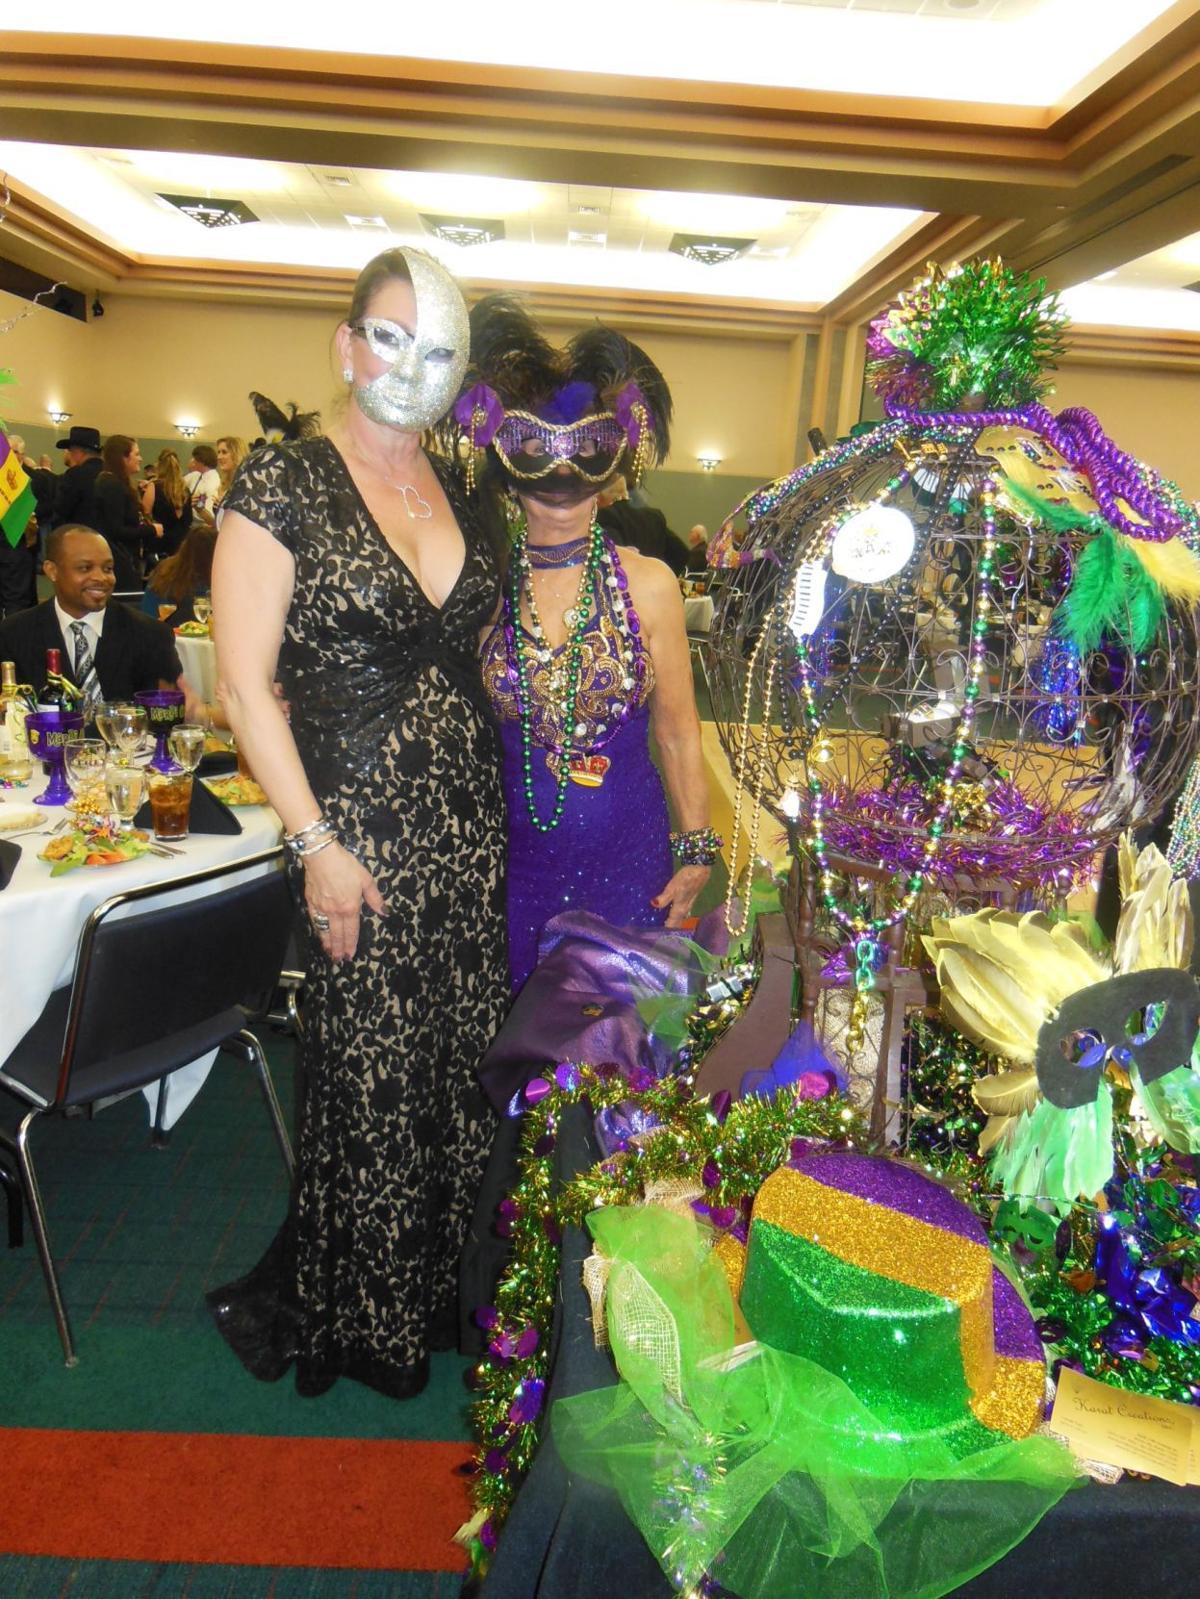 Mardi Gras Mainland Gala III